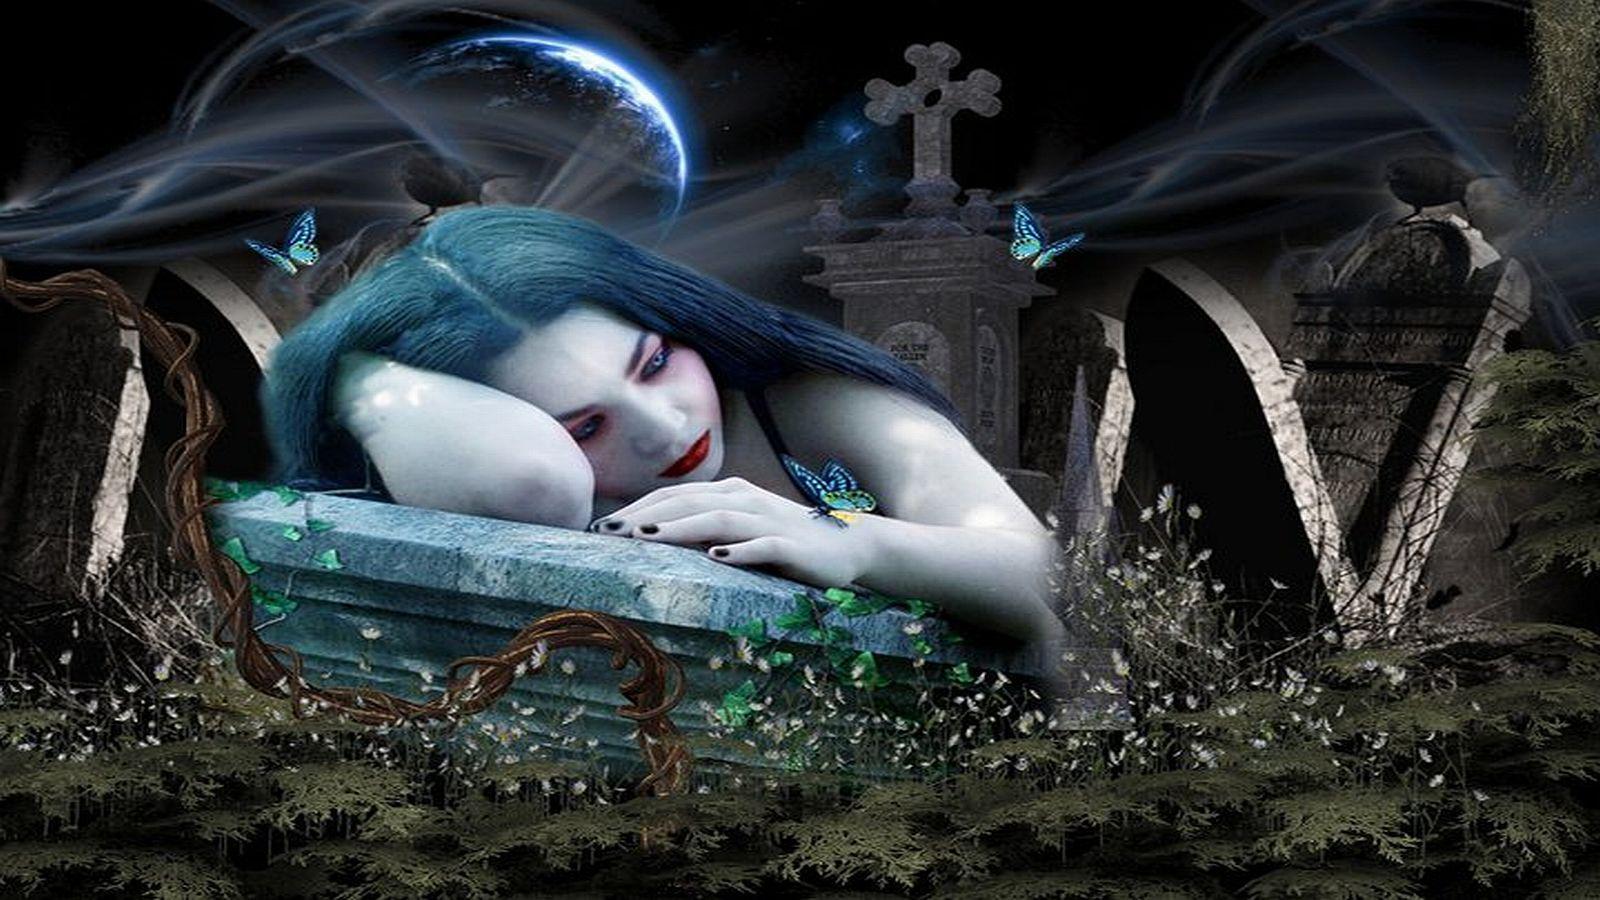 pinkelly engstrom on gothic women | pinterest | dark gothic